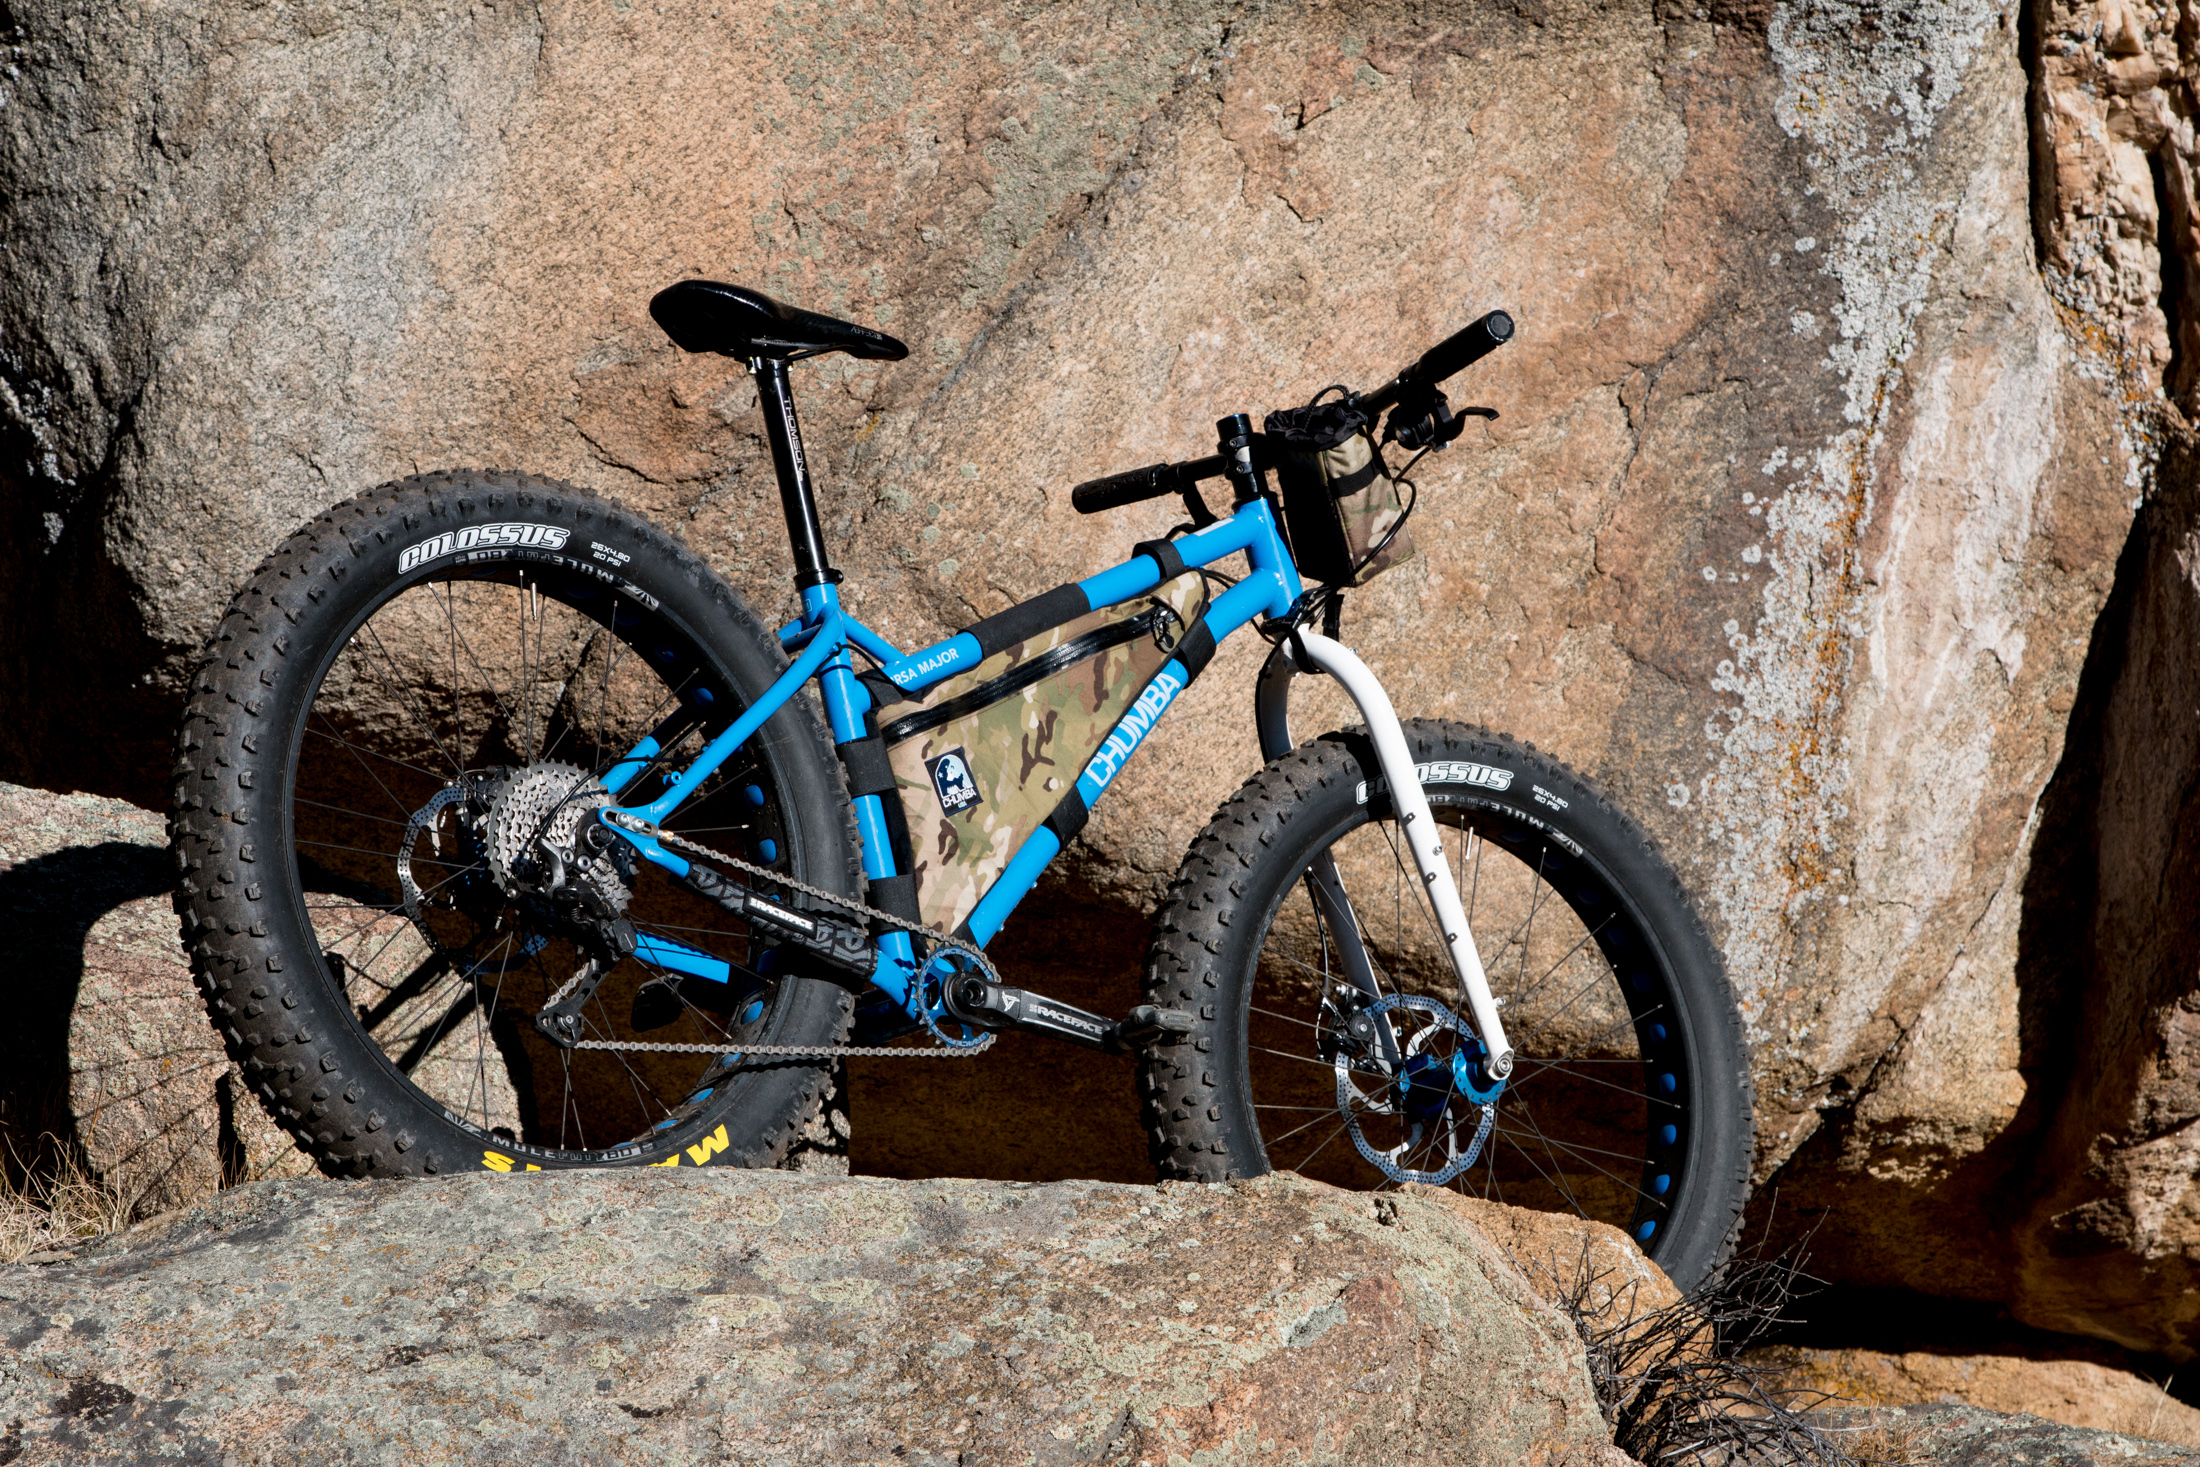 chumba ursa major fat bike test ride review singletracks. Black Bedroom Furniture Sets. Home Design Ideas